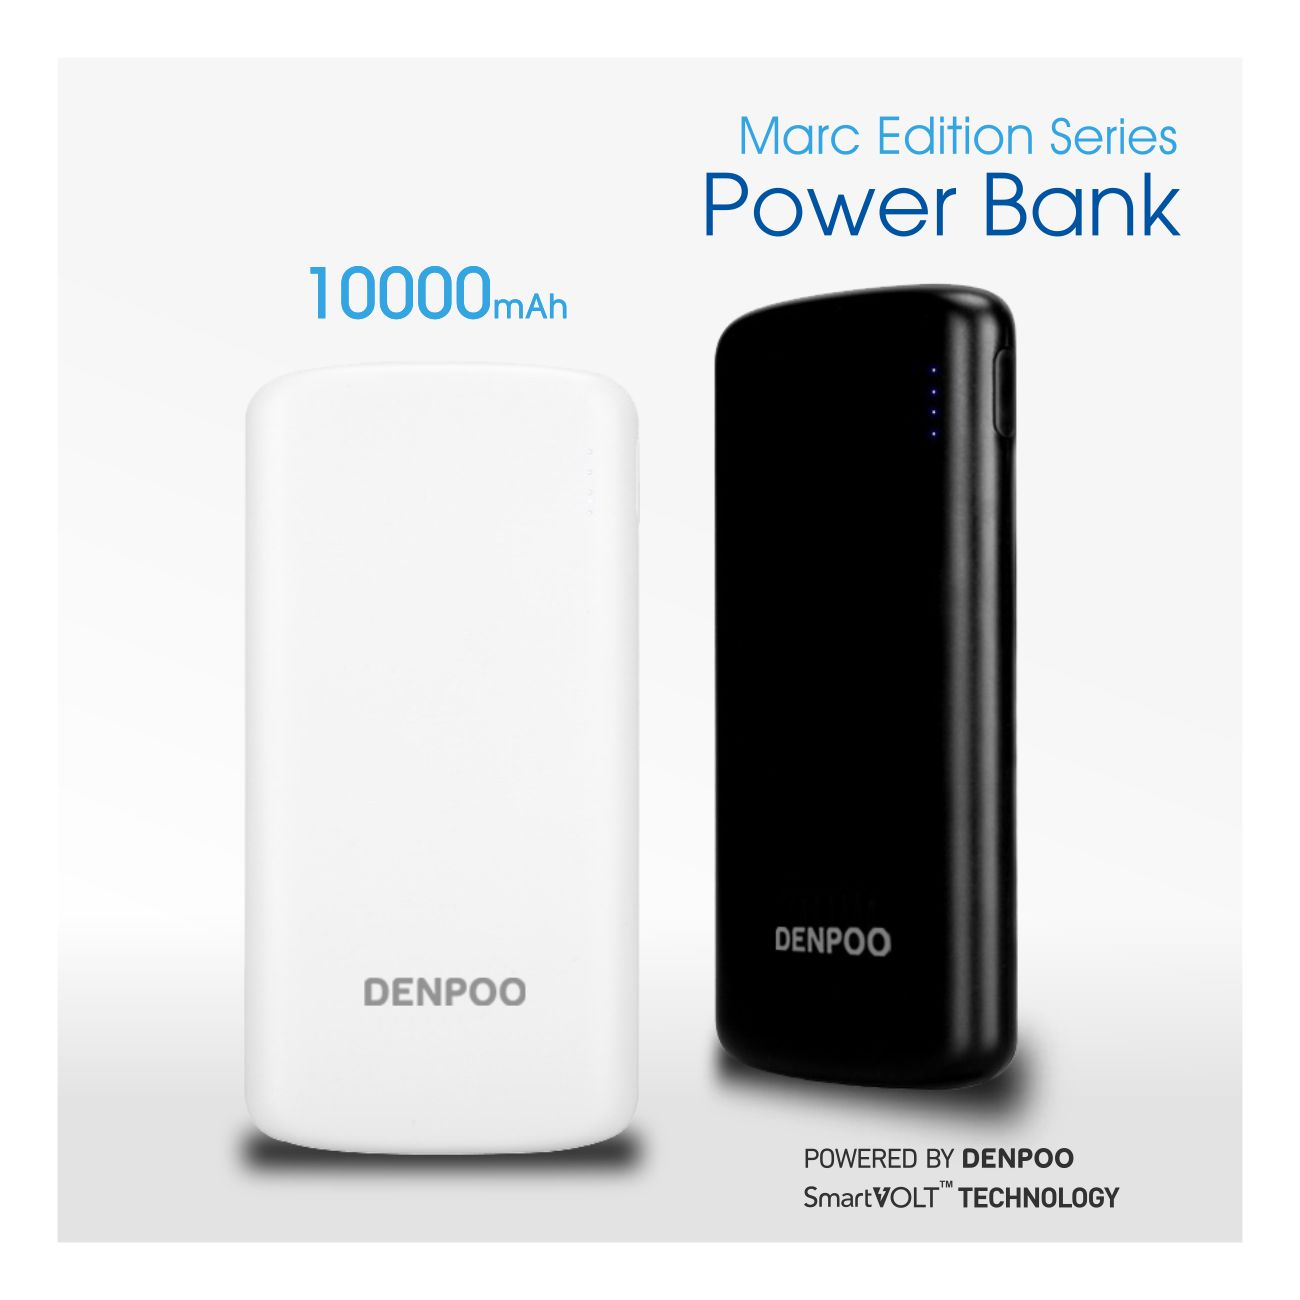 PowerBank (Marc Edition) 1